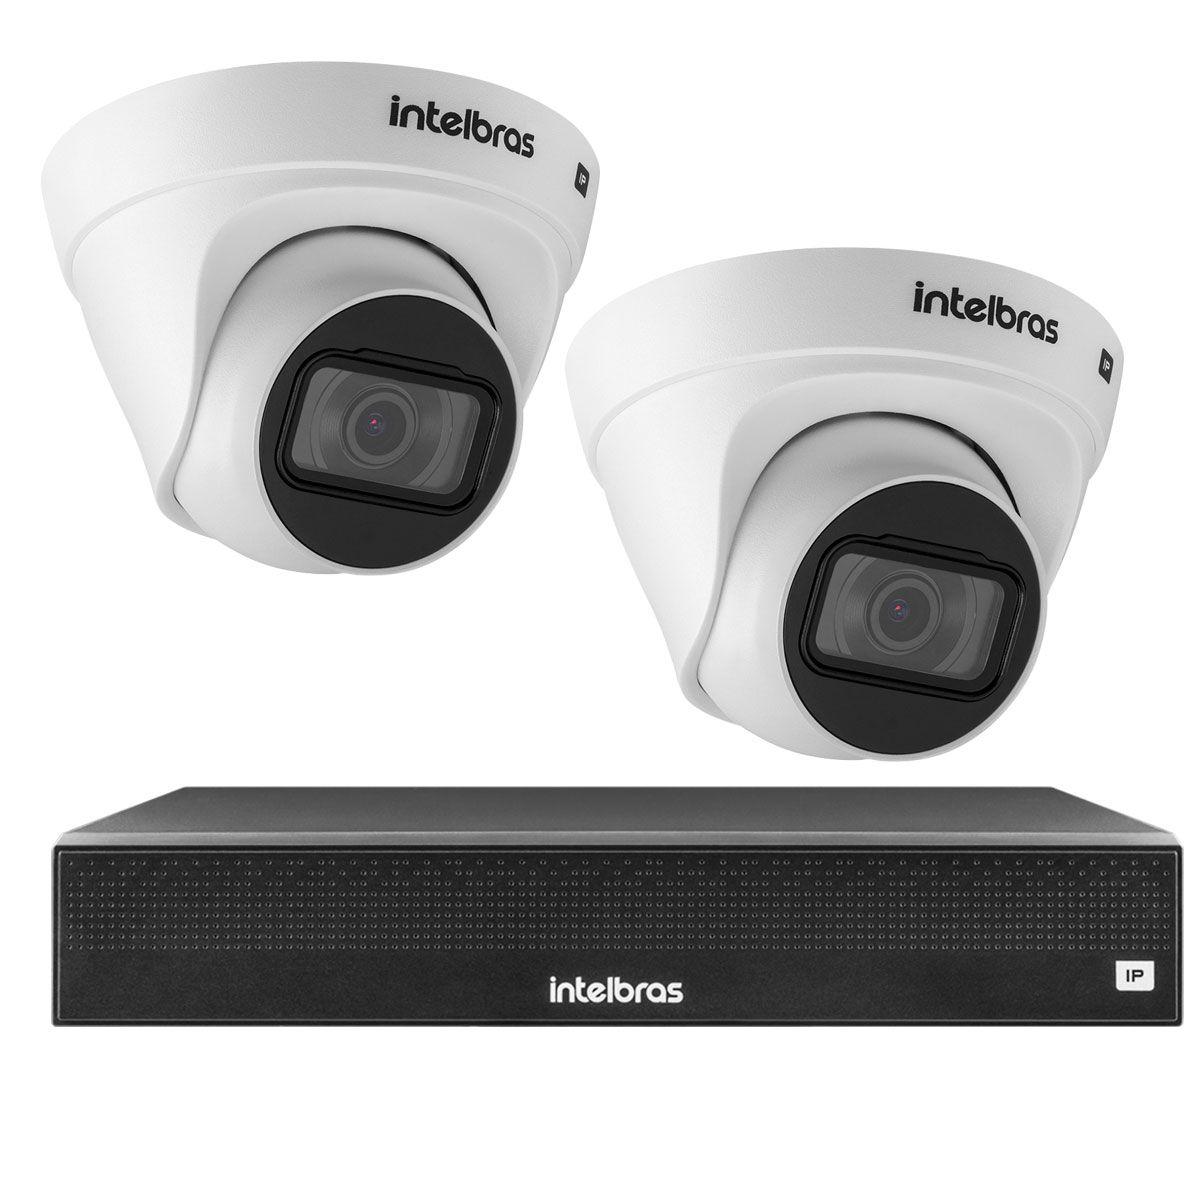 kit-2-cameras-vip-1020-d-g2-nvr-intelbras-app-gratis-de-monitoramento-cameras-hd-720p-20m-infravermelho-de-visao-noturna-intelbras